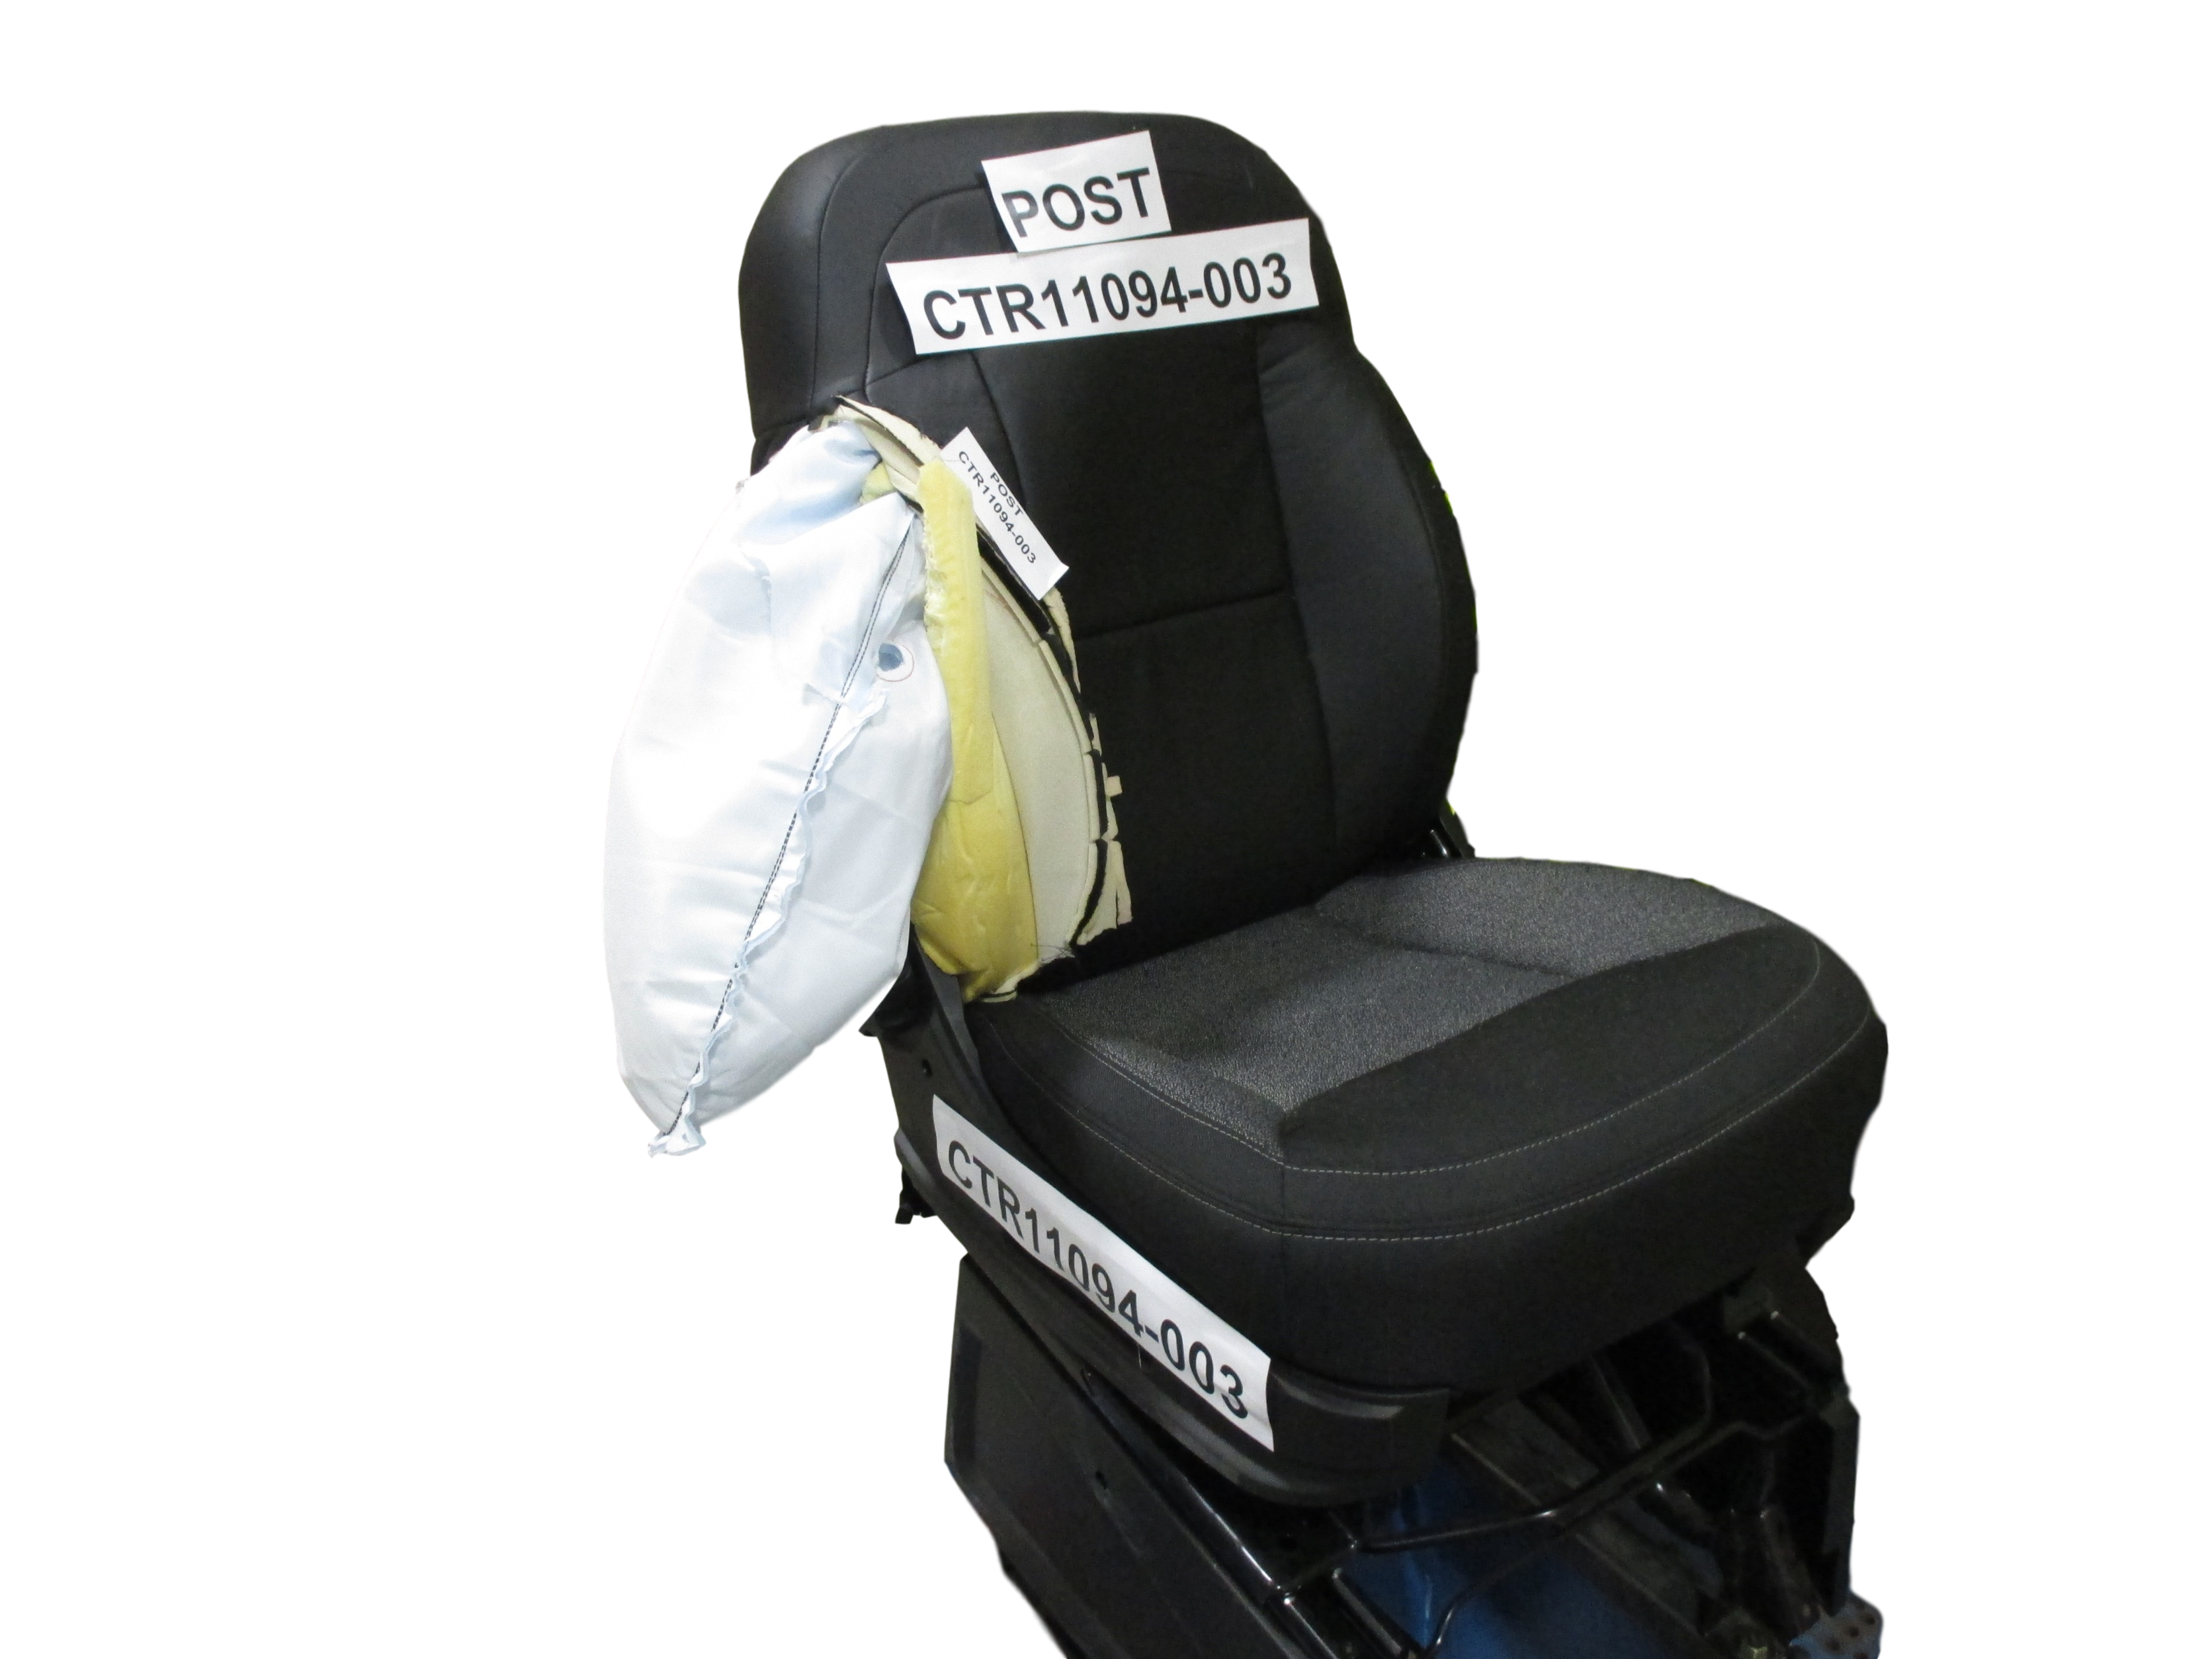 Airbag Recover - HSM - Van/Bus Seat